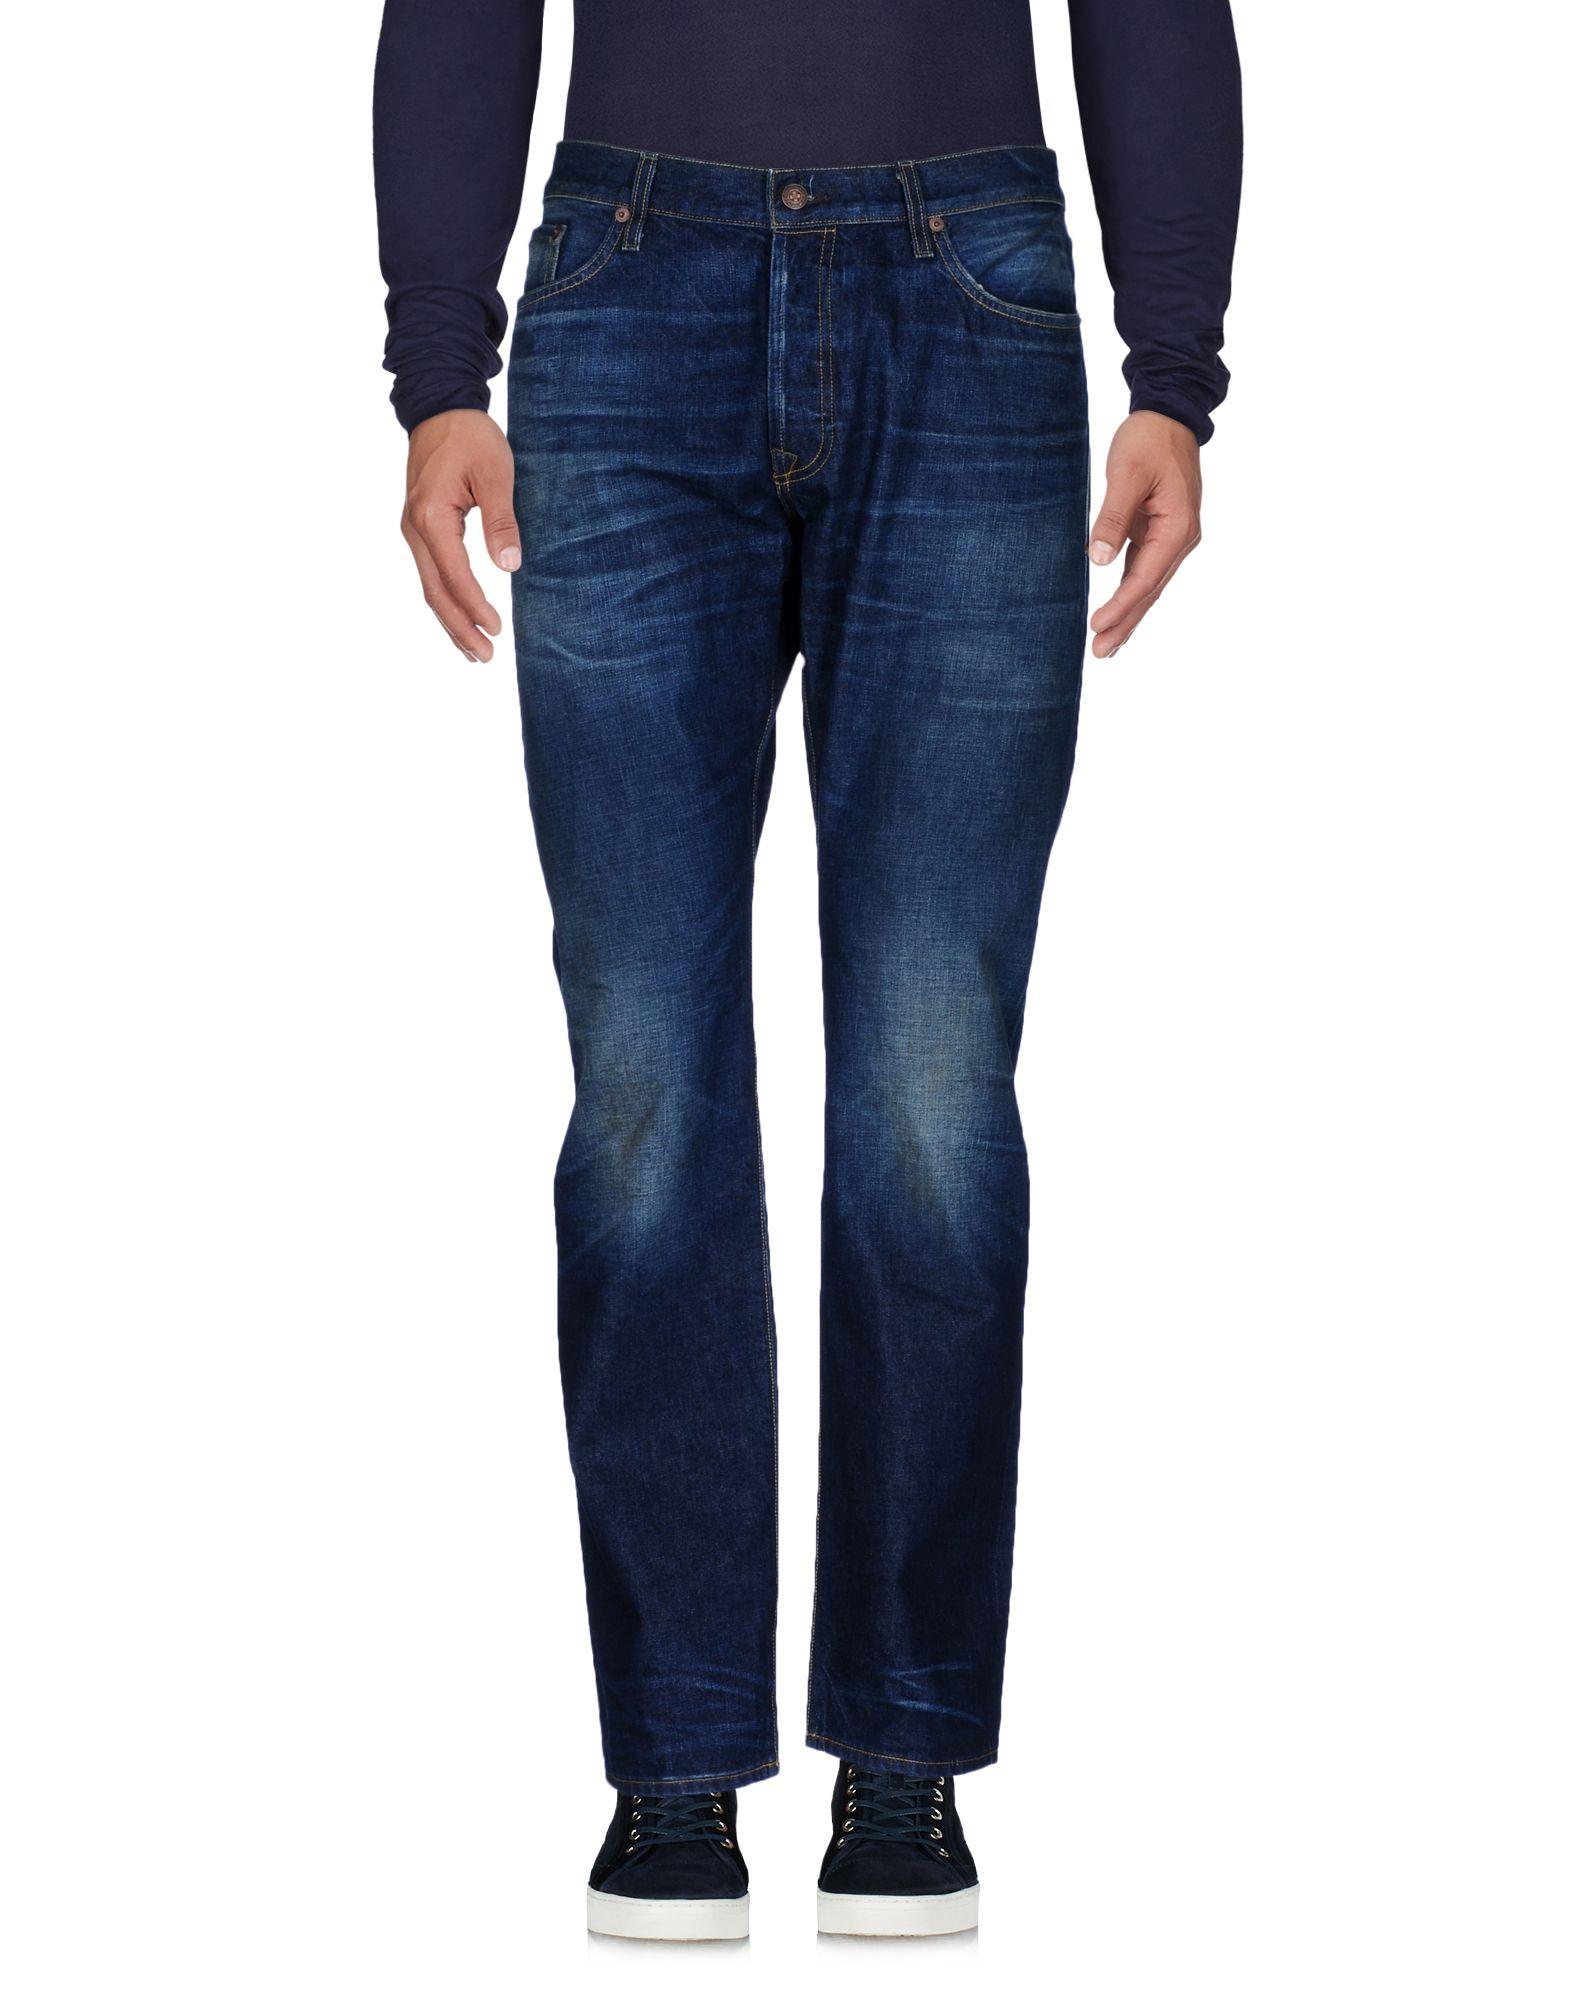 Pantaloni Jeans Imogene + Willie Uomo - Acquista online su